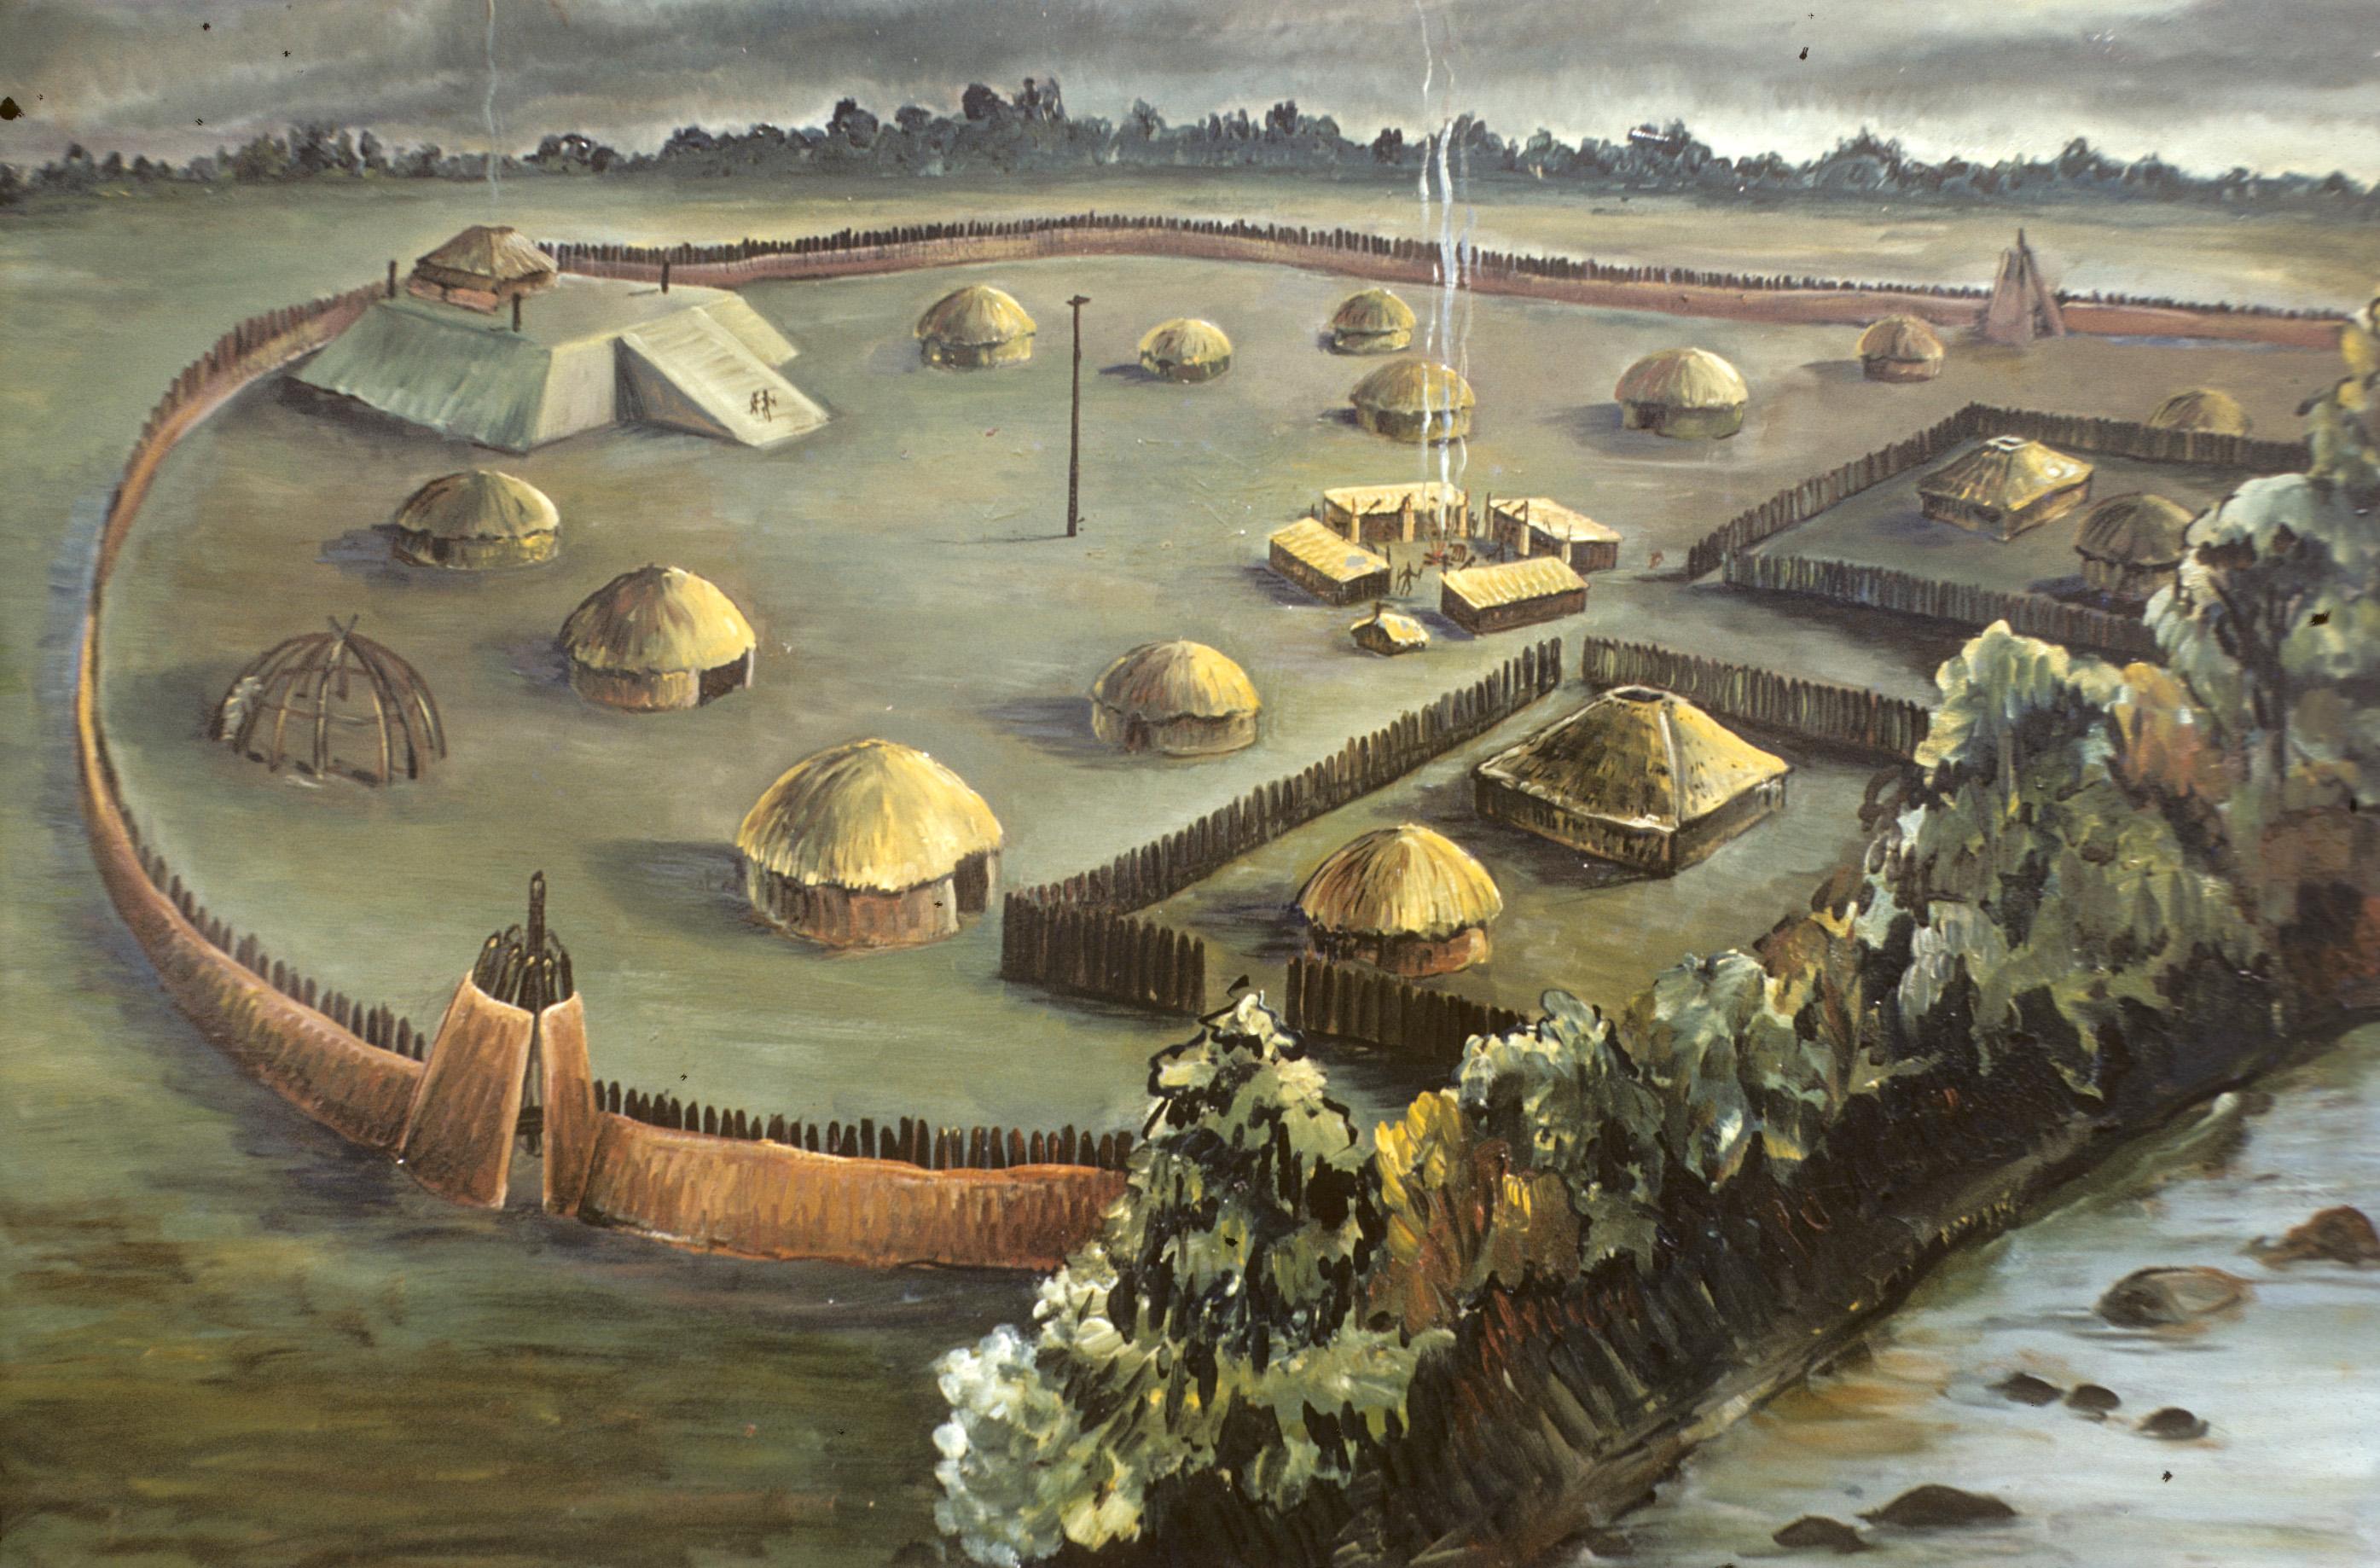 Artist's illustration of Town Creek